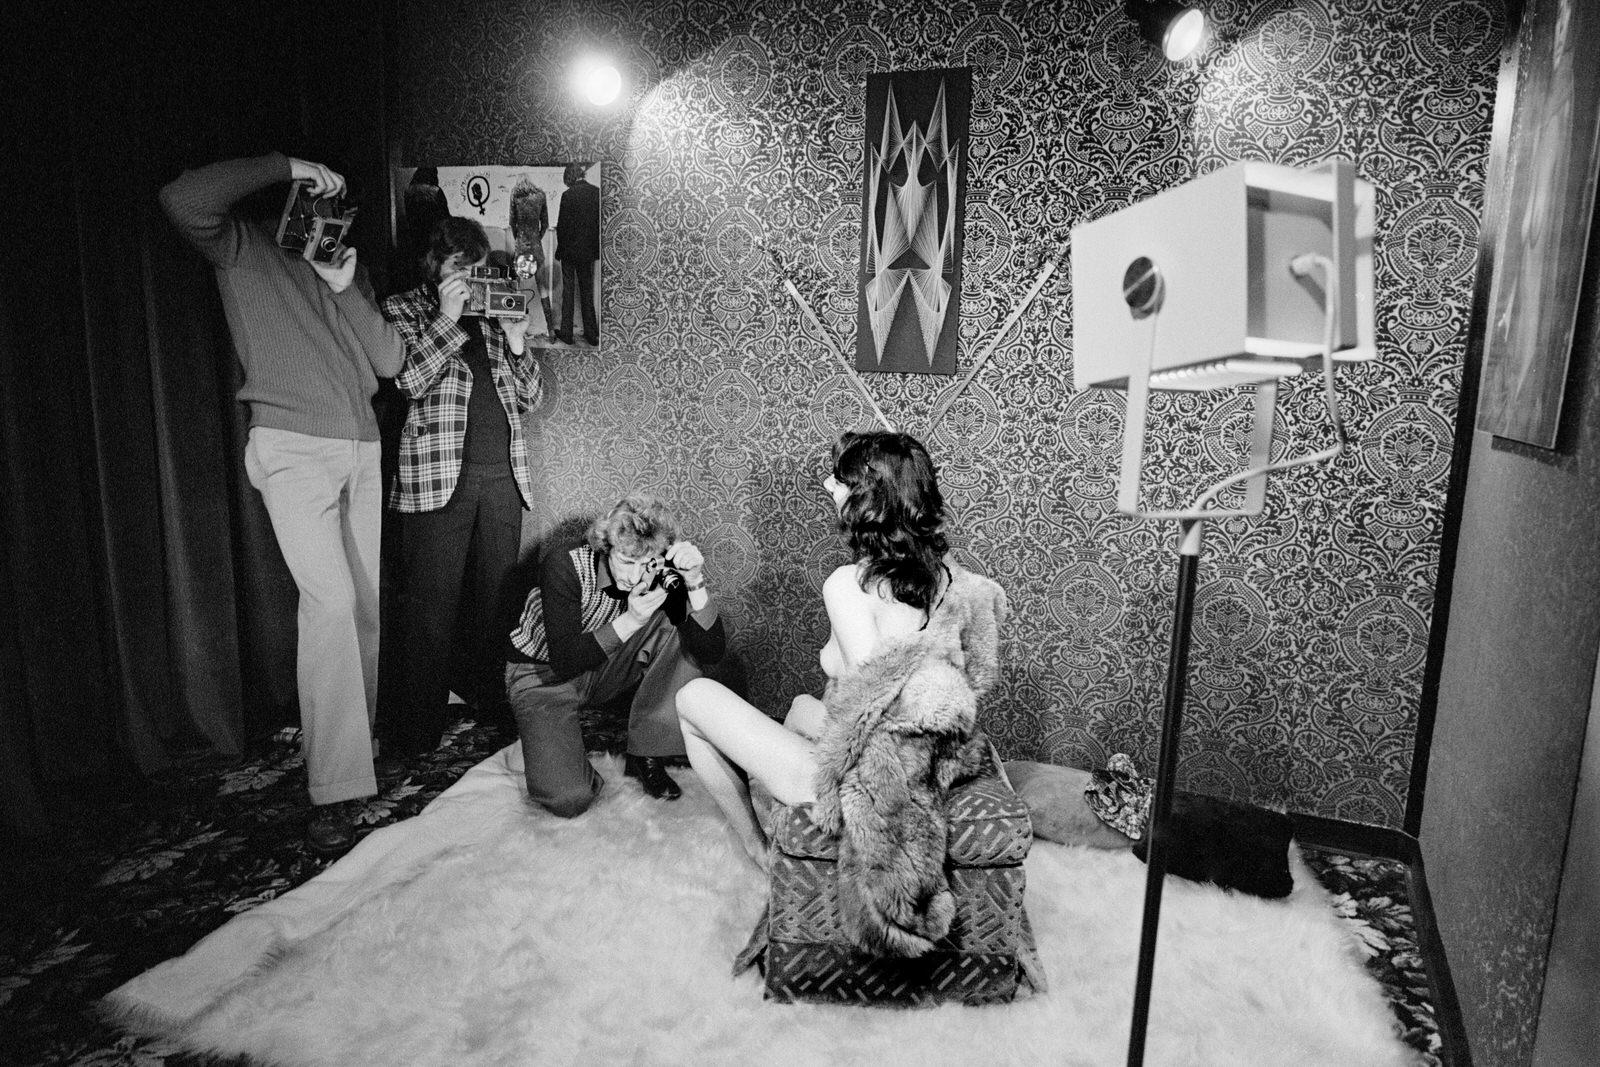 Salon Klick & Fick, Zwinglistrasse 28, Zürich, 1973